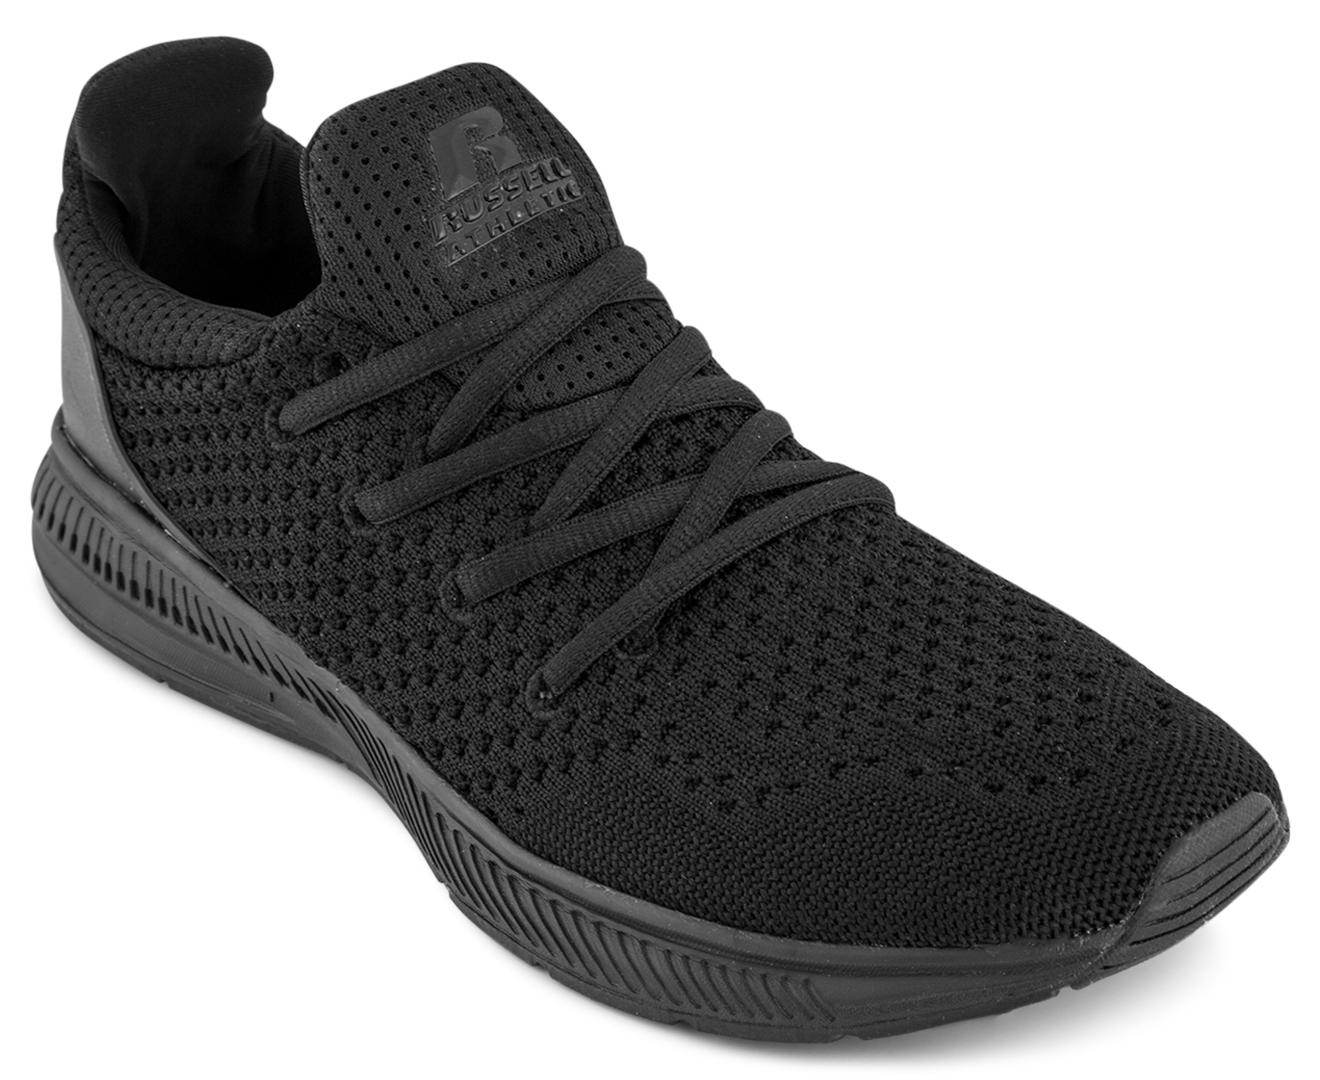 Russell Athletic Menu0026#39;s Zero Training Shoe - Black | EBay